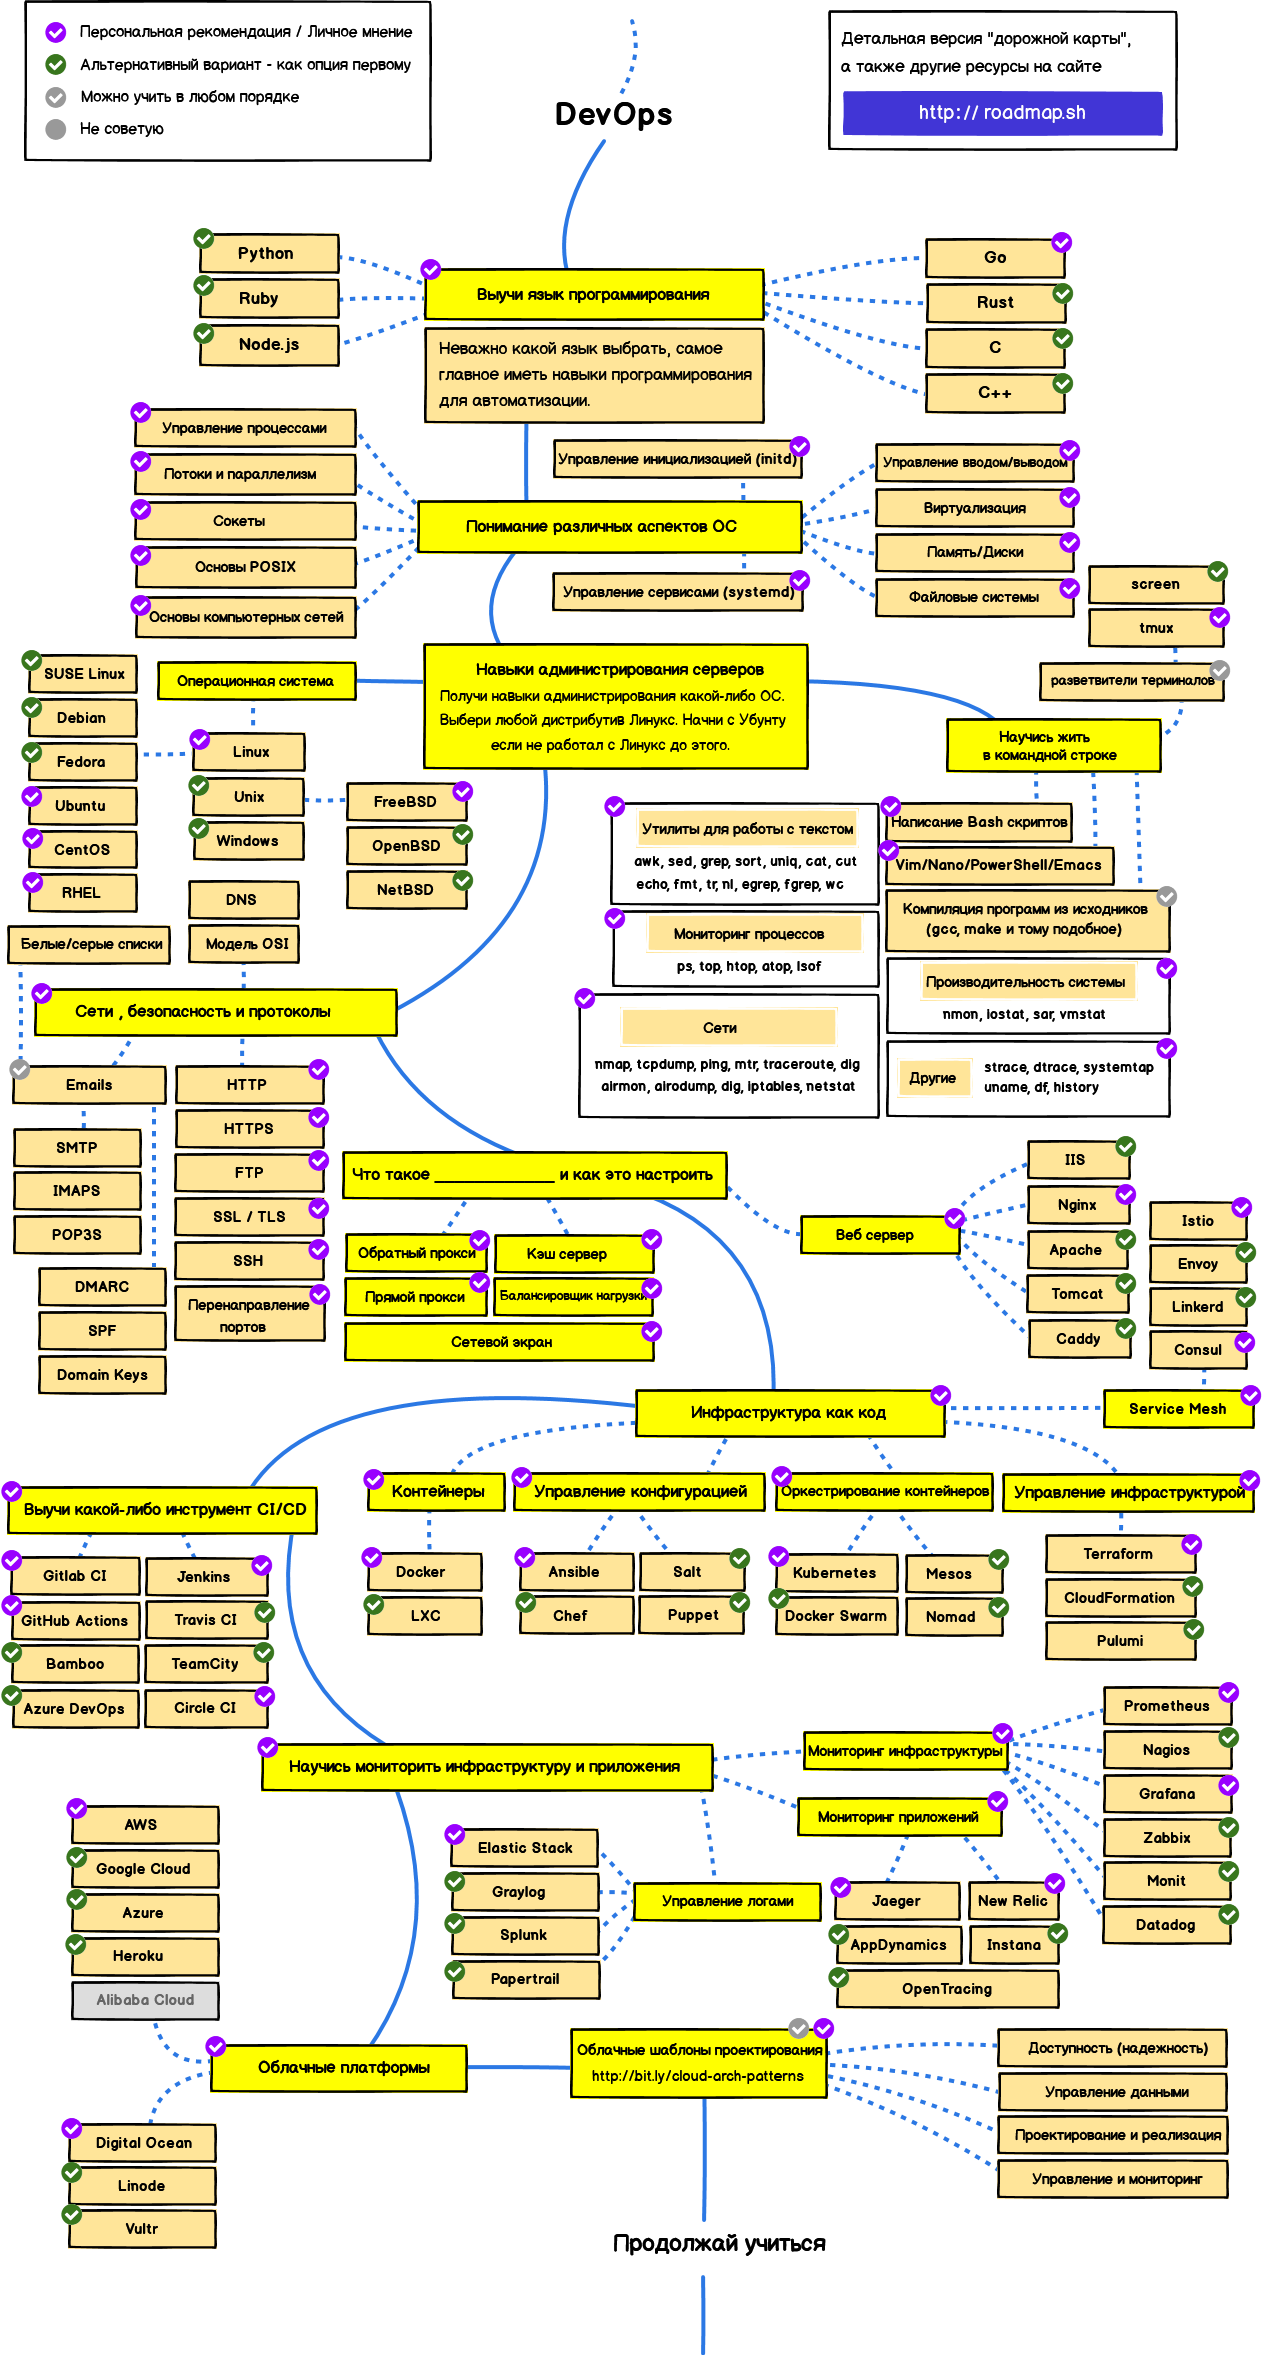 Дорожная карта специалиста DevOps